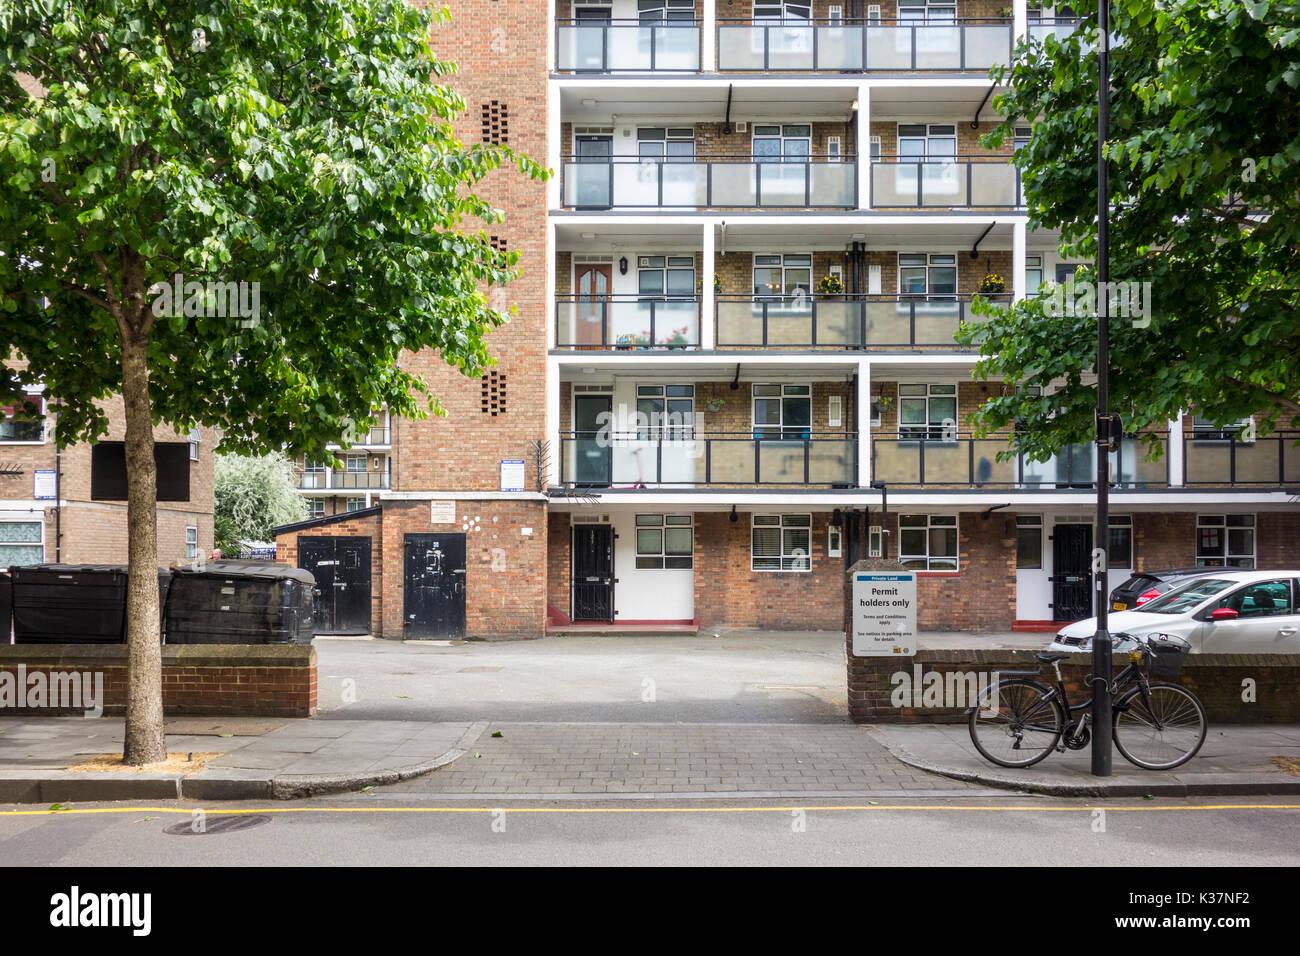 Peabody Buildings, flats, apartments, social housing. Banner Street, London, UK - Stock Image